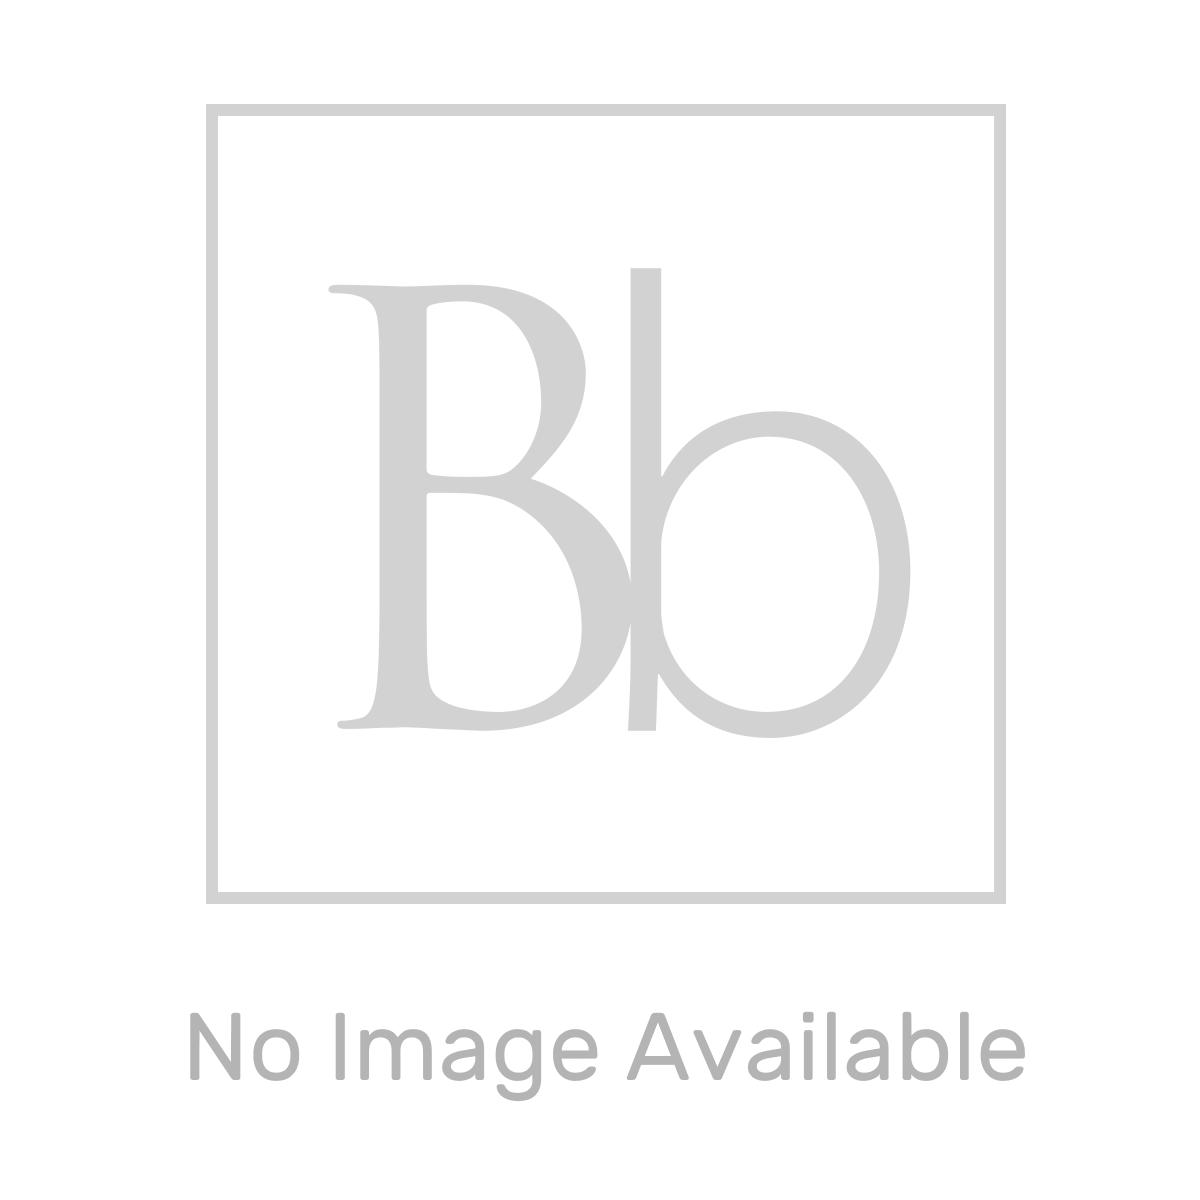 Premier Linton Single Ended Bath 1400 x 700mm Dimensions